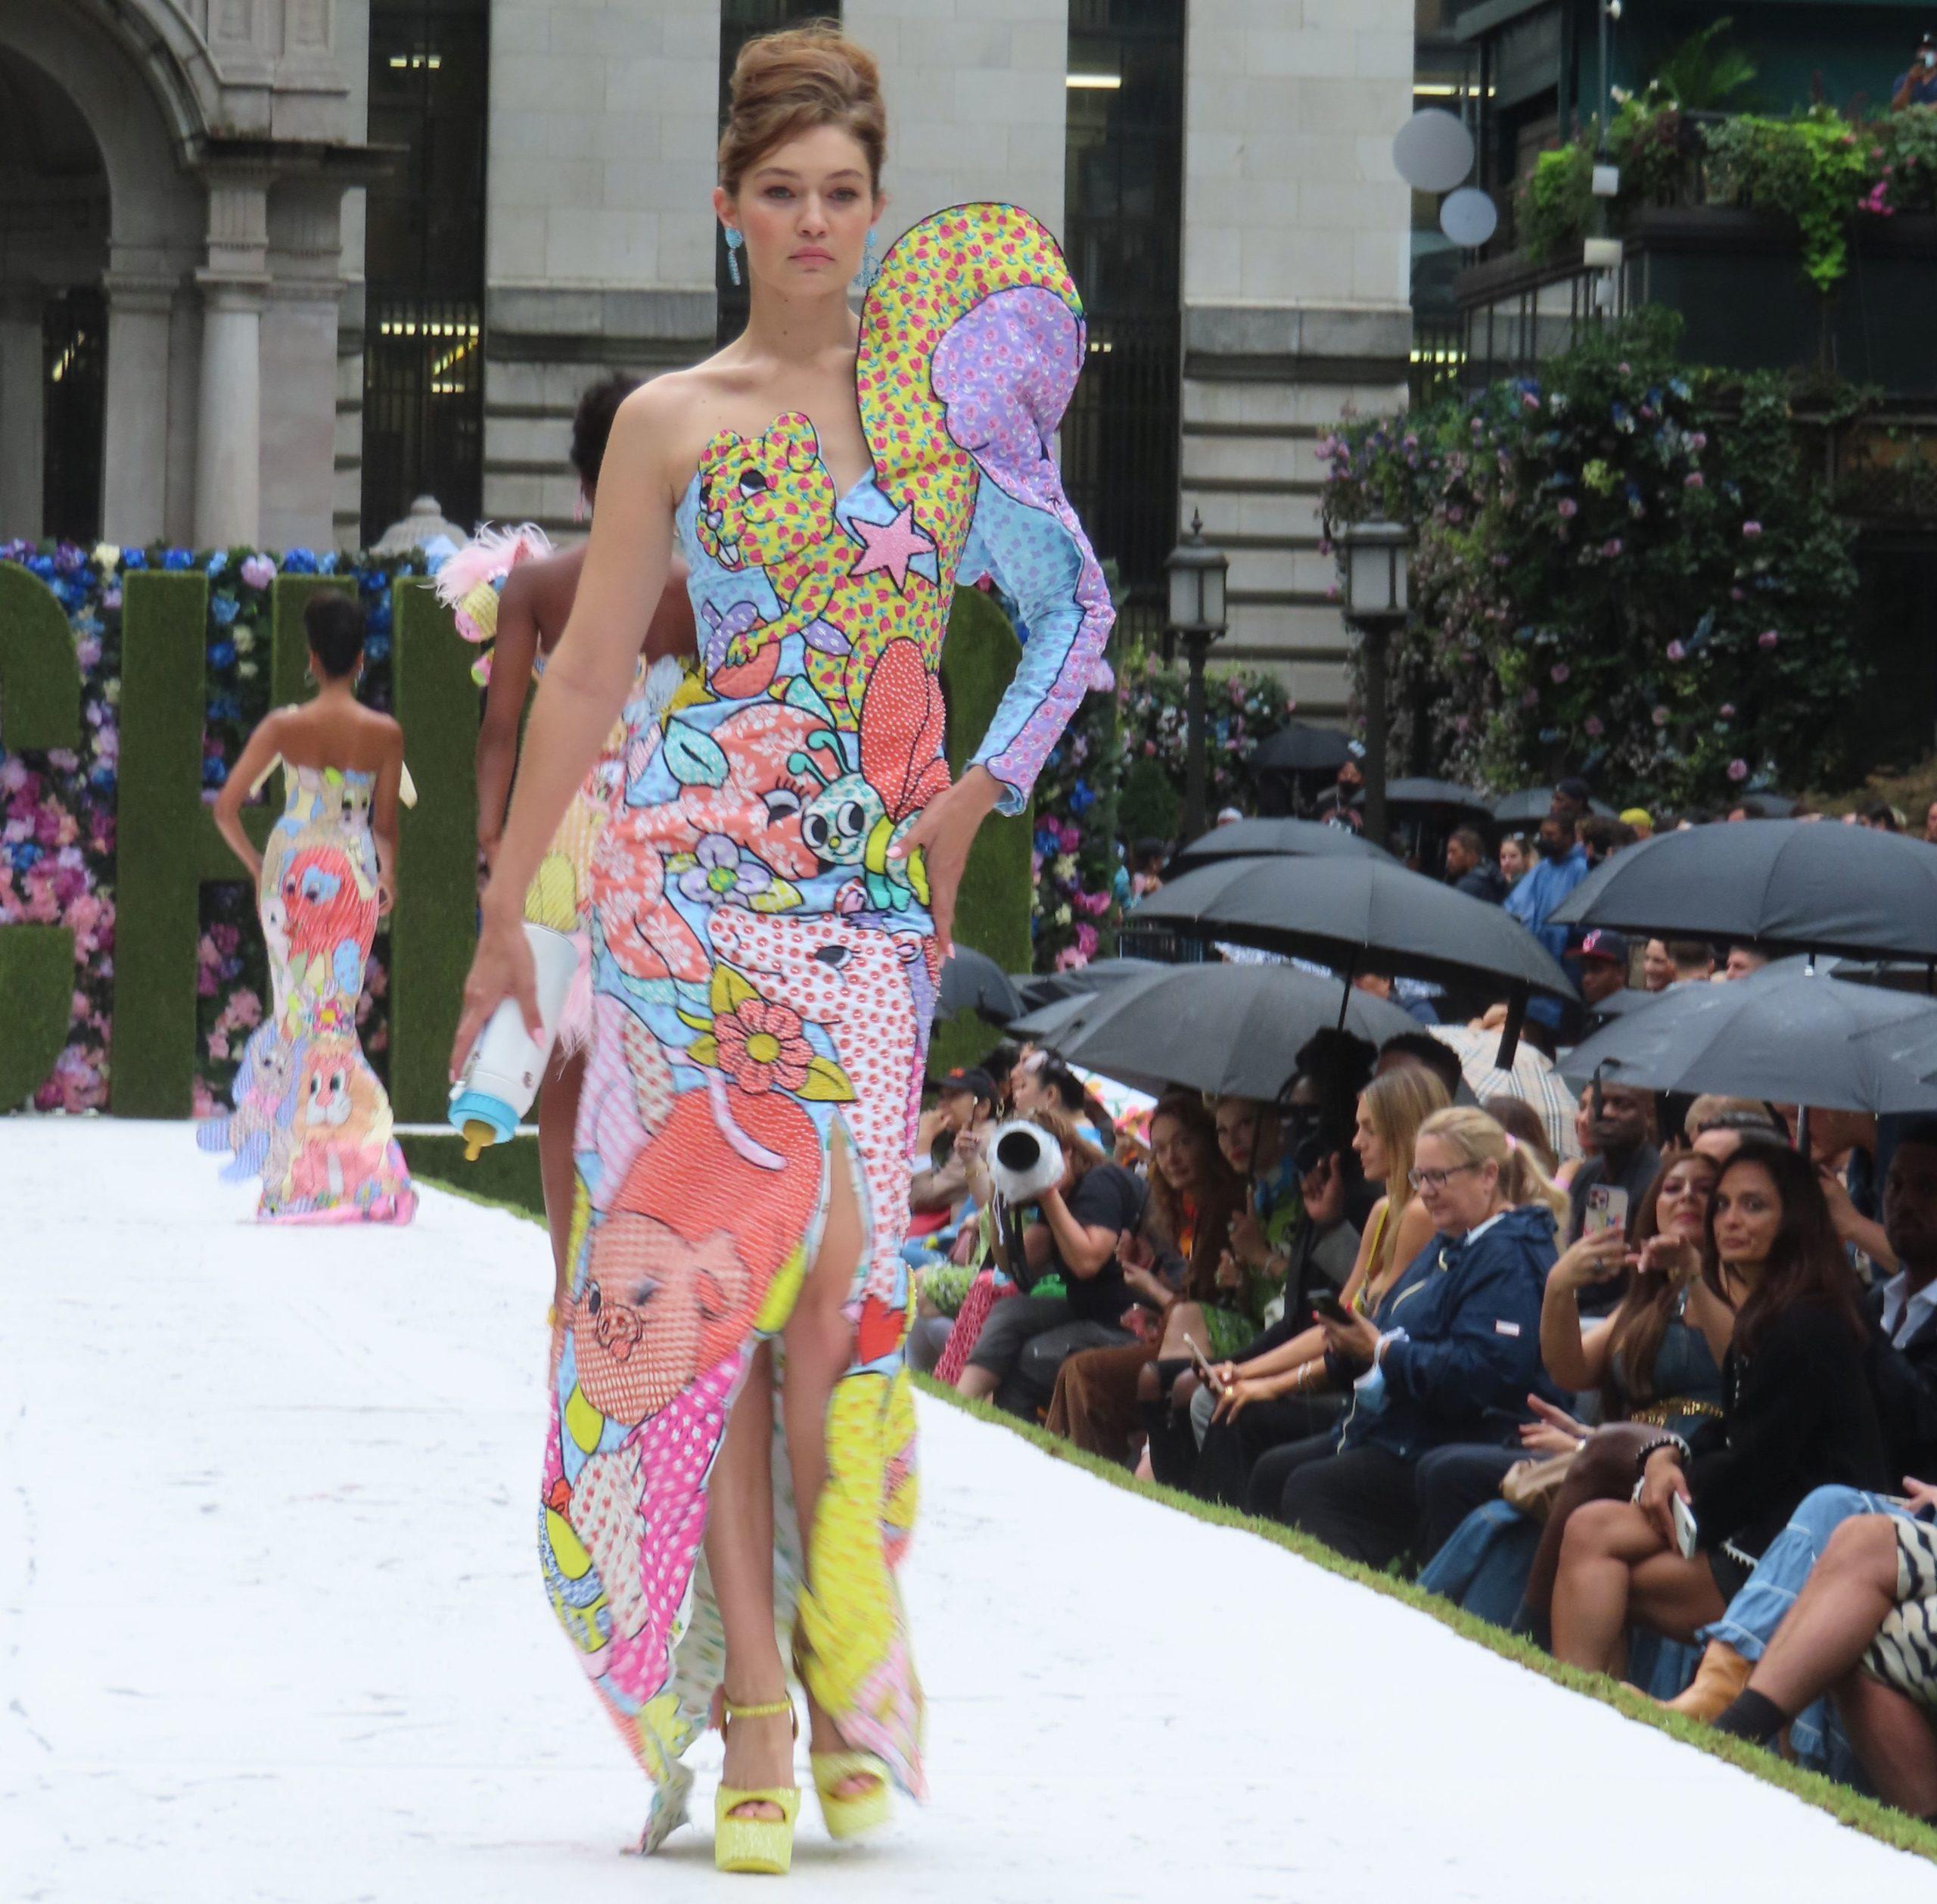 Gigi Hadid Moschino fashion show in NYC. (Photo credit: Rick Davis / SplashNews.com)